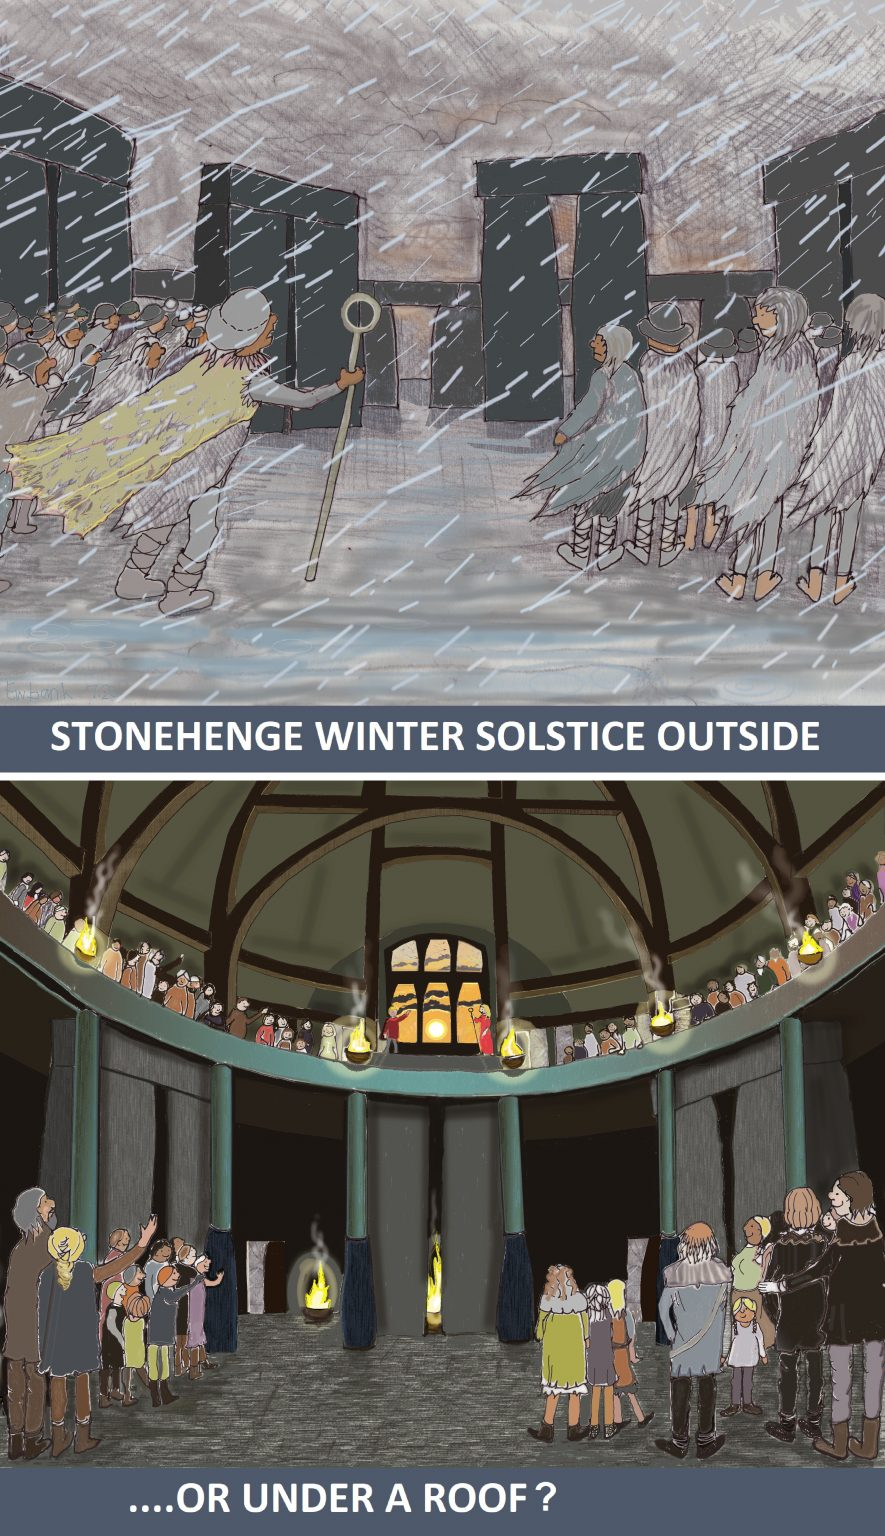 Stonehenge celebrations by Sarah Ewbank